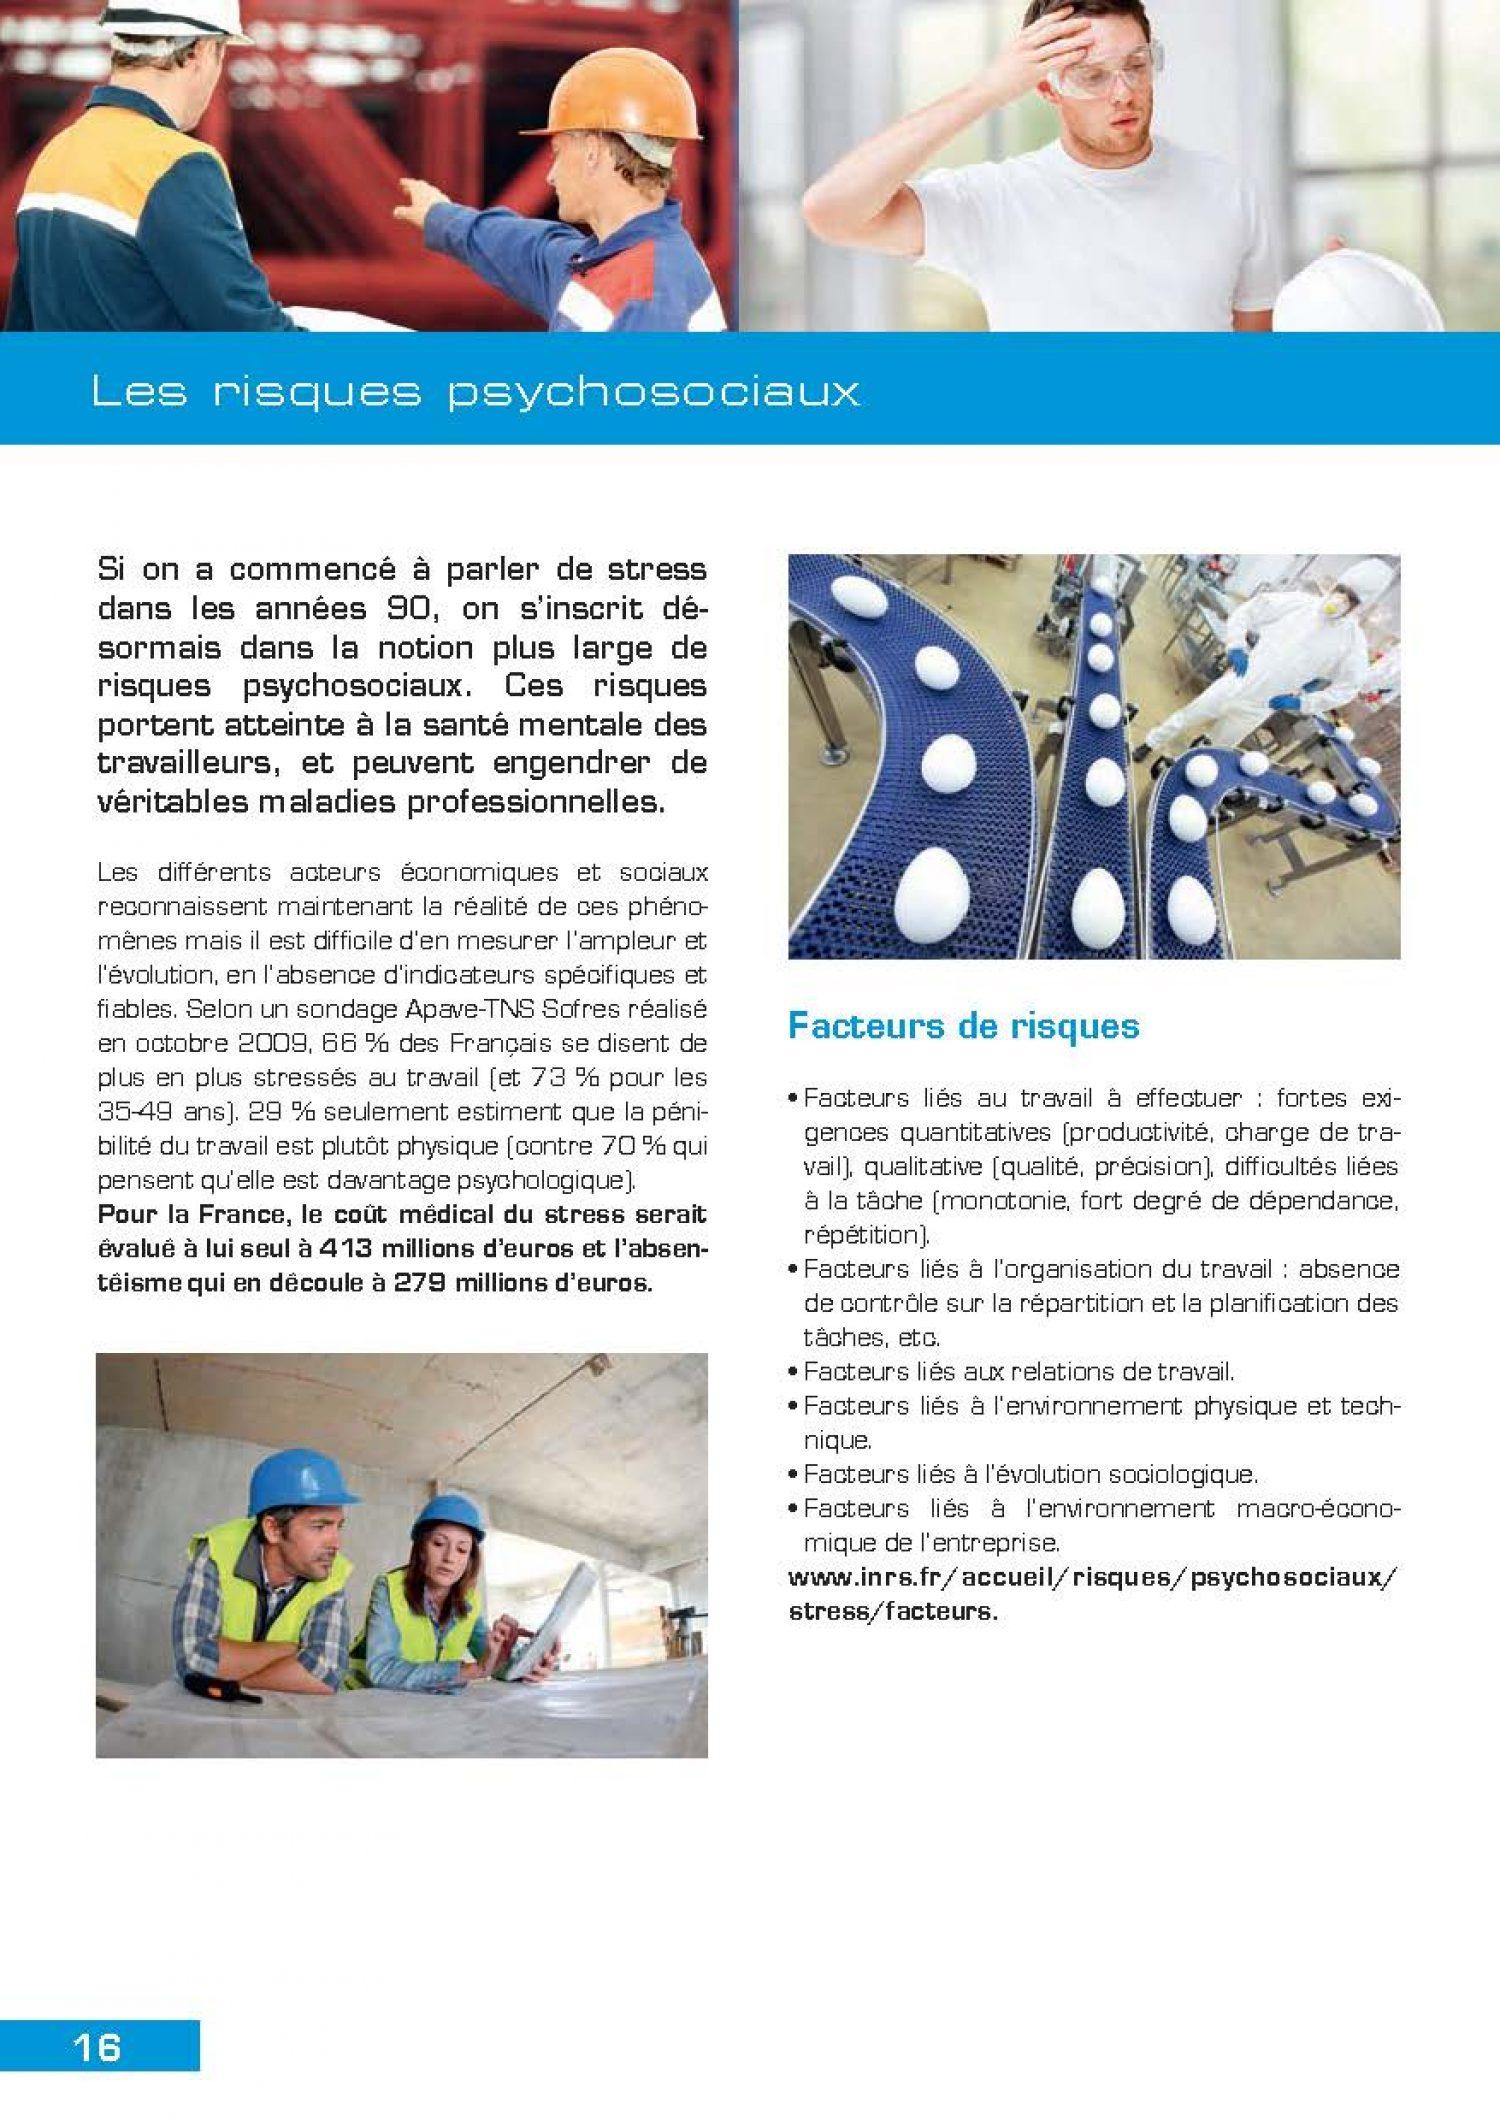 Guide Securite au Travail 2014 HDpdf_Page_16